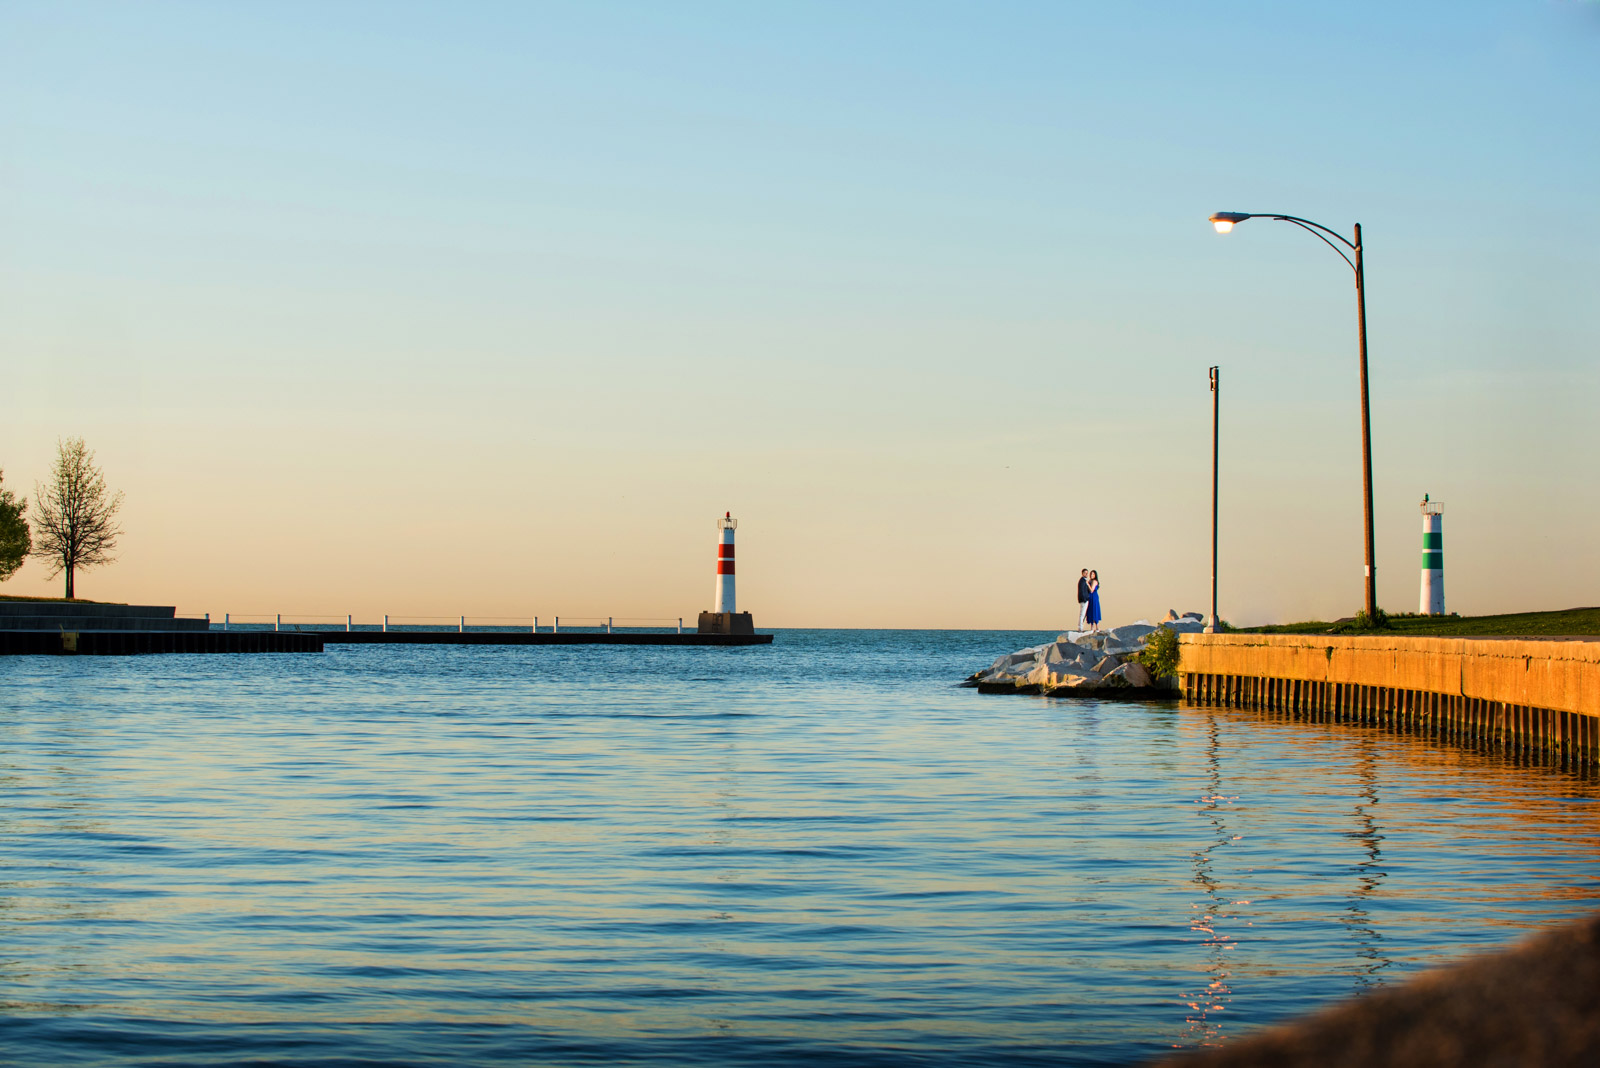 Engagement session photo captured on Lake Michigan at Montrose Harbor